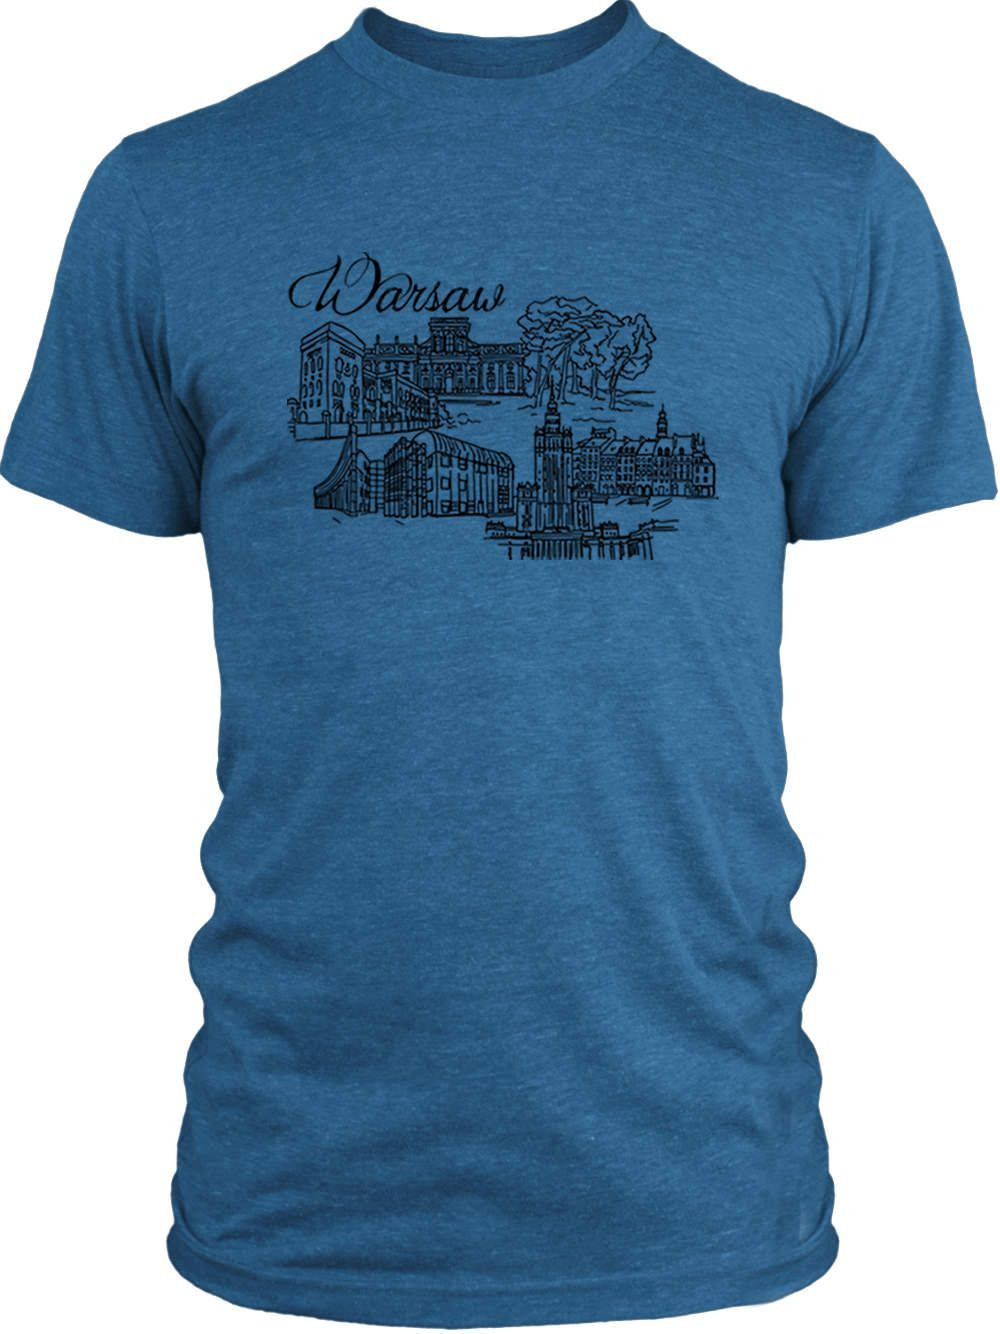 Big Texas The Beautiful City of Warsaw (Black) Vintage Tri-Blend T-Shirt